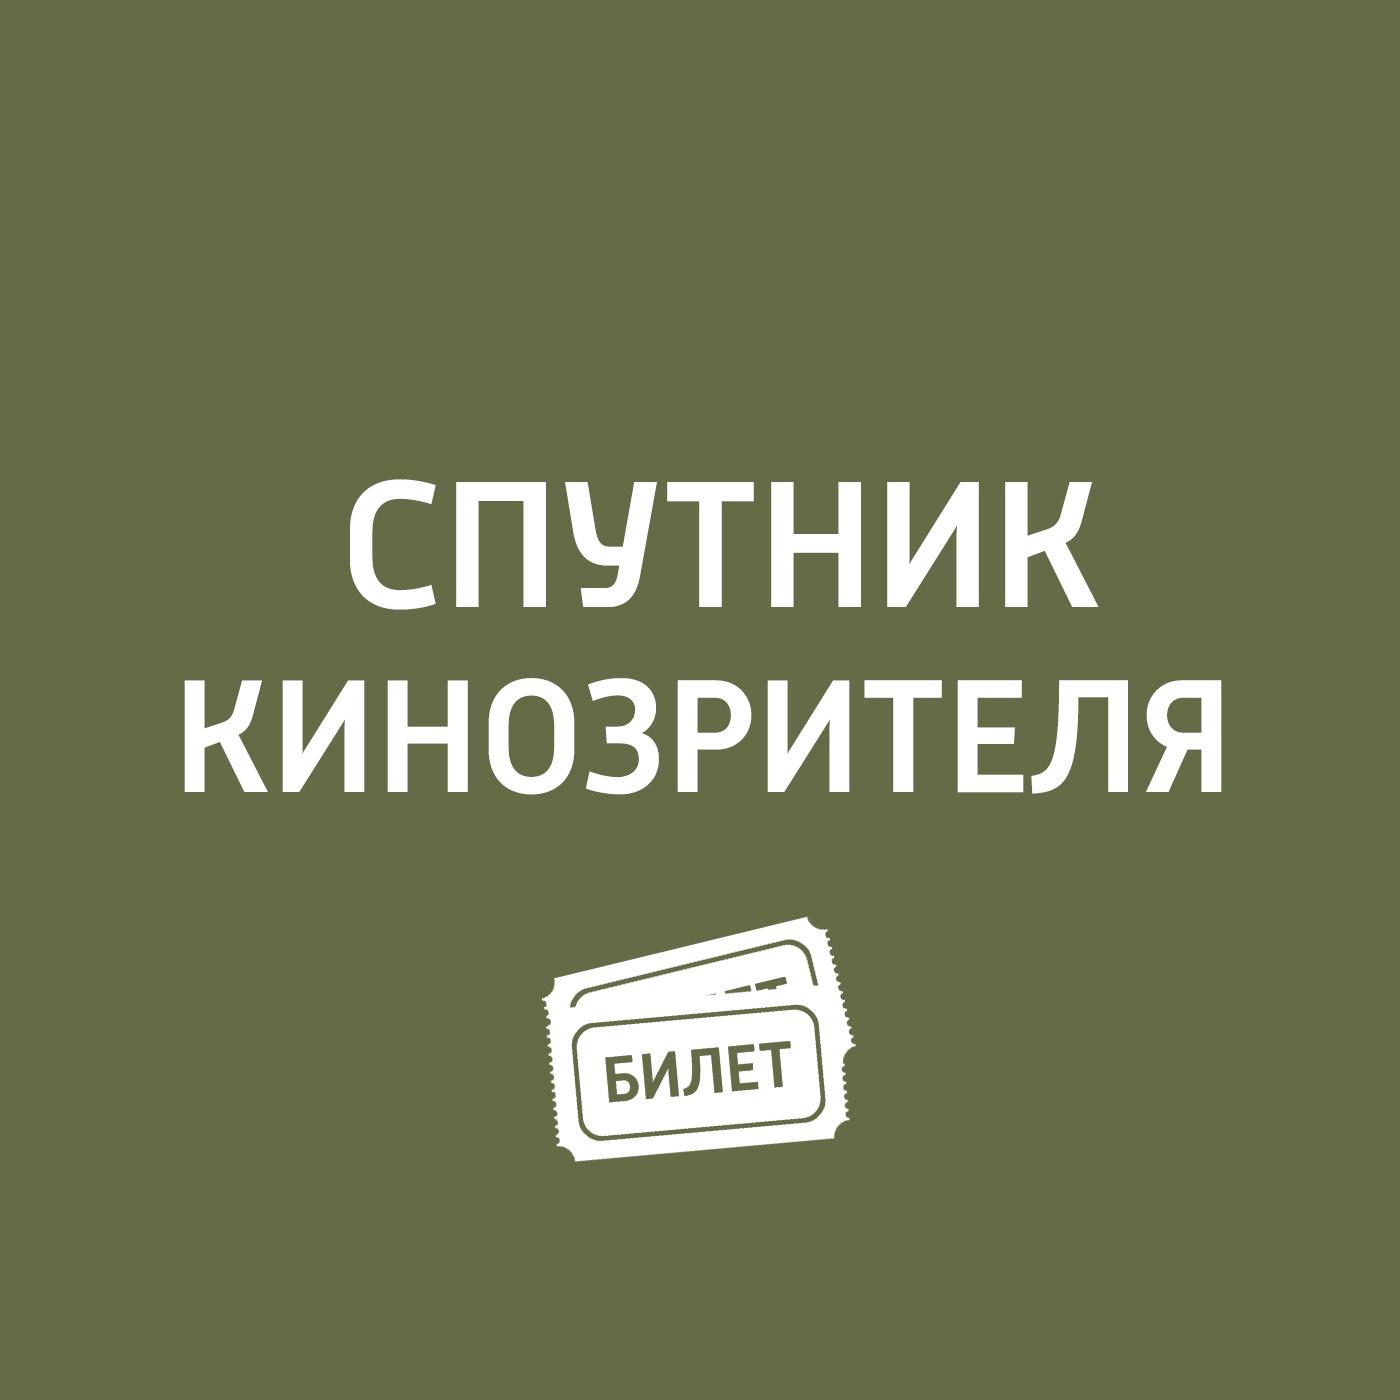 Антон Долин Курьер из «Рая, «Шоппинг-тур, «Каньоны тур де шанс фильм 2014